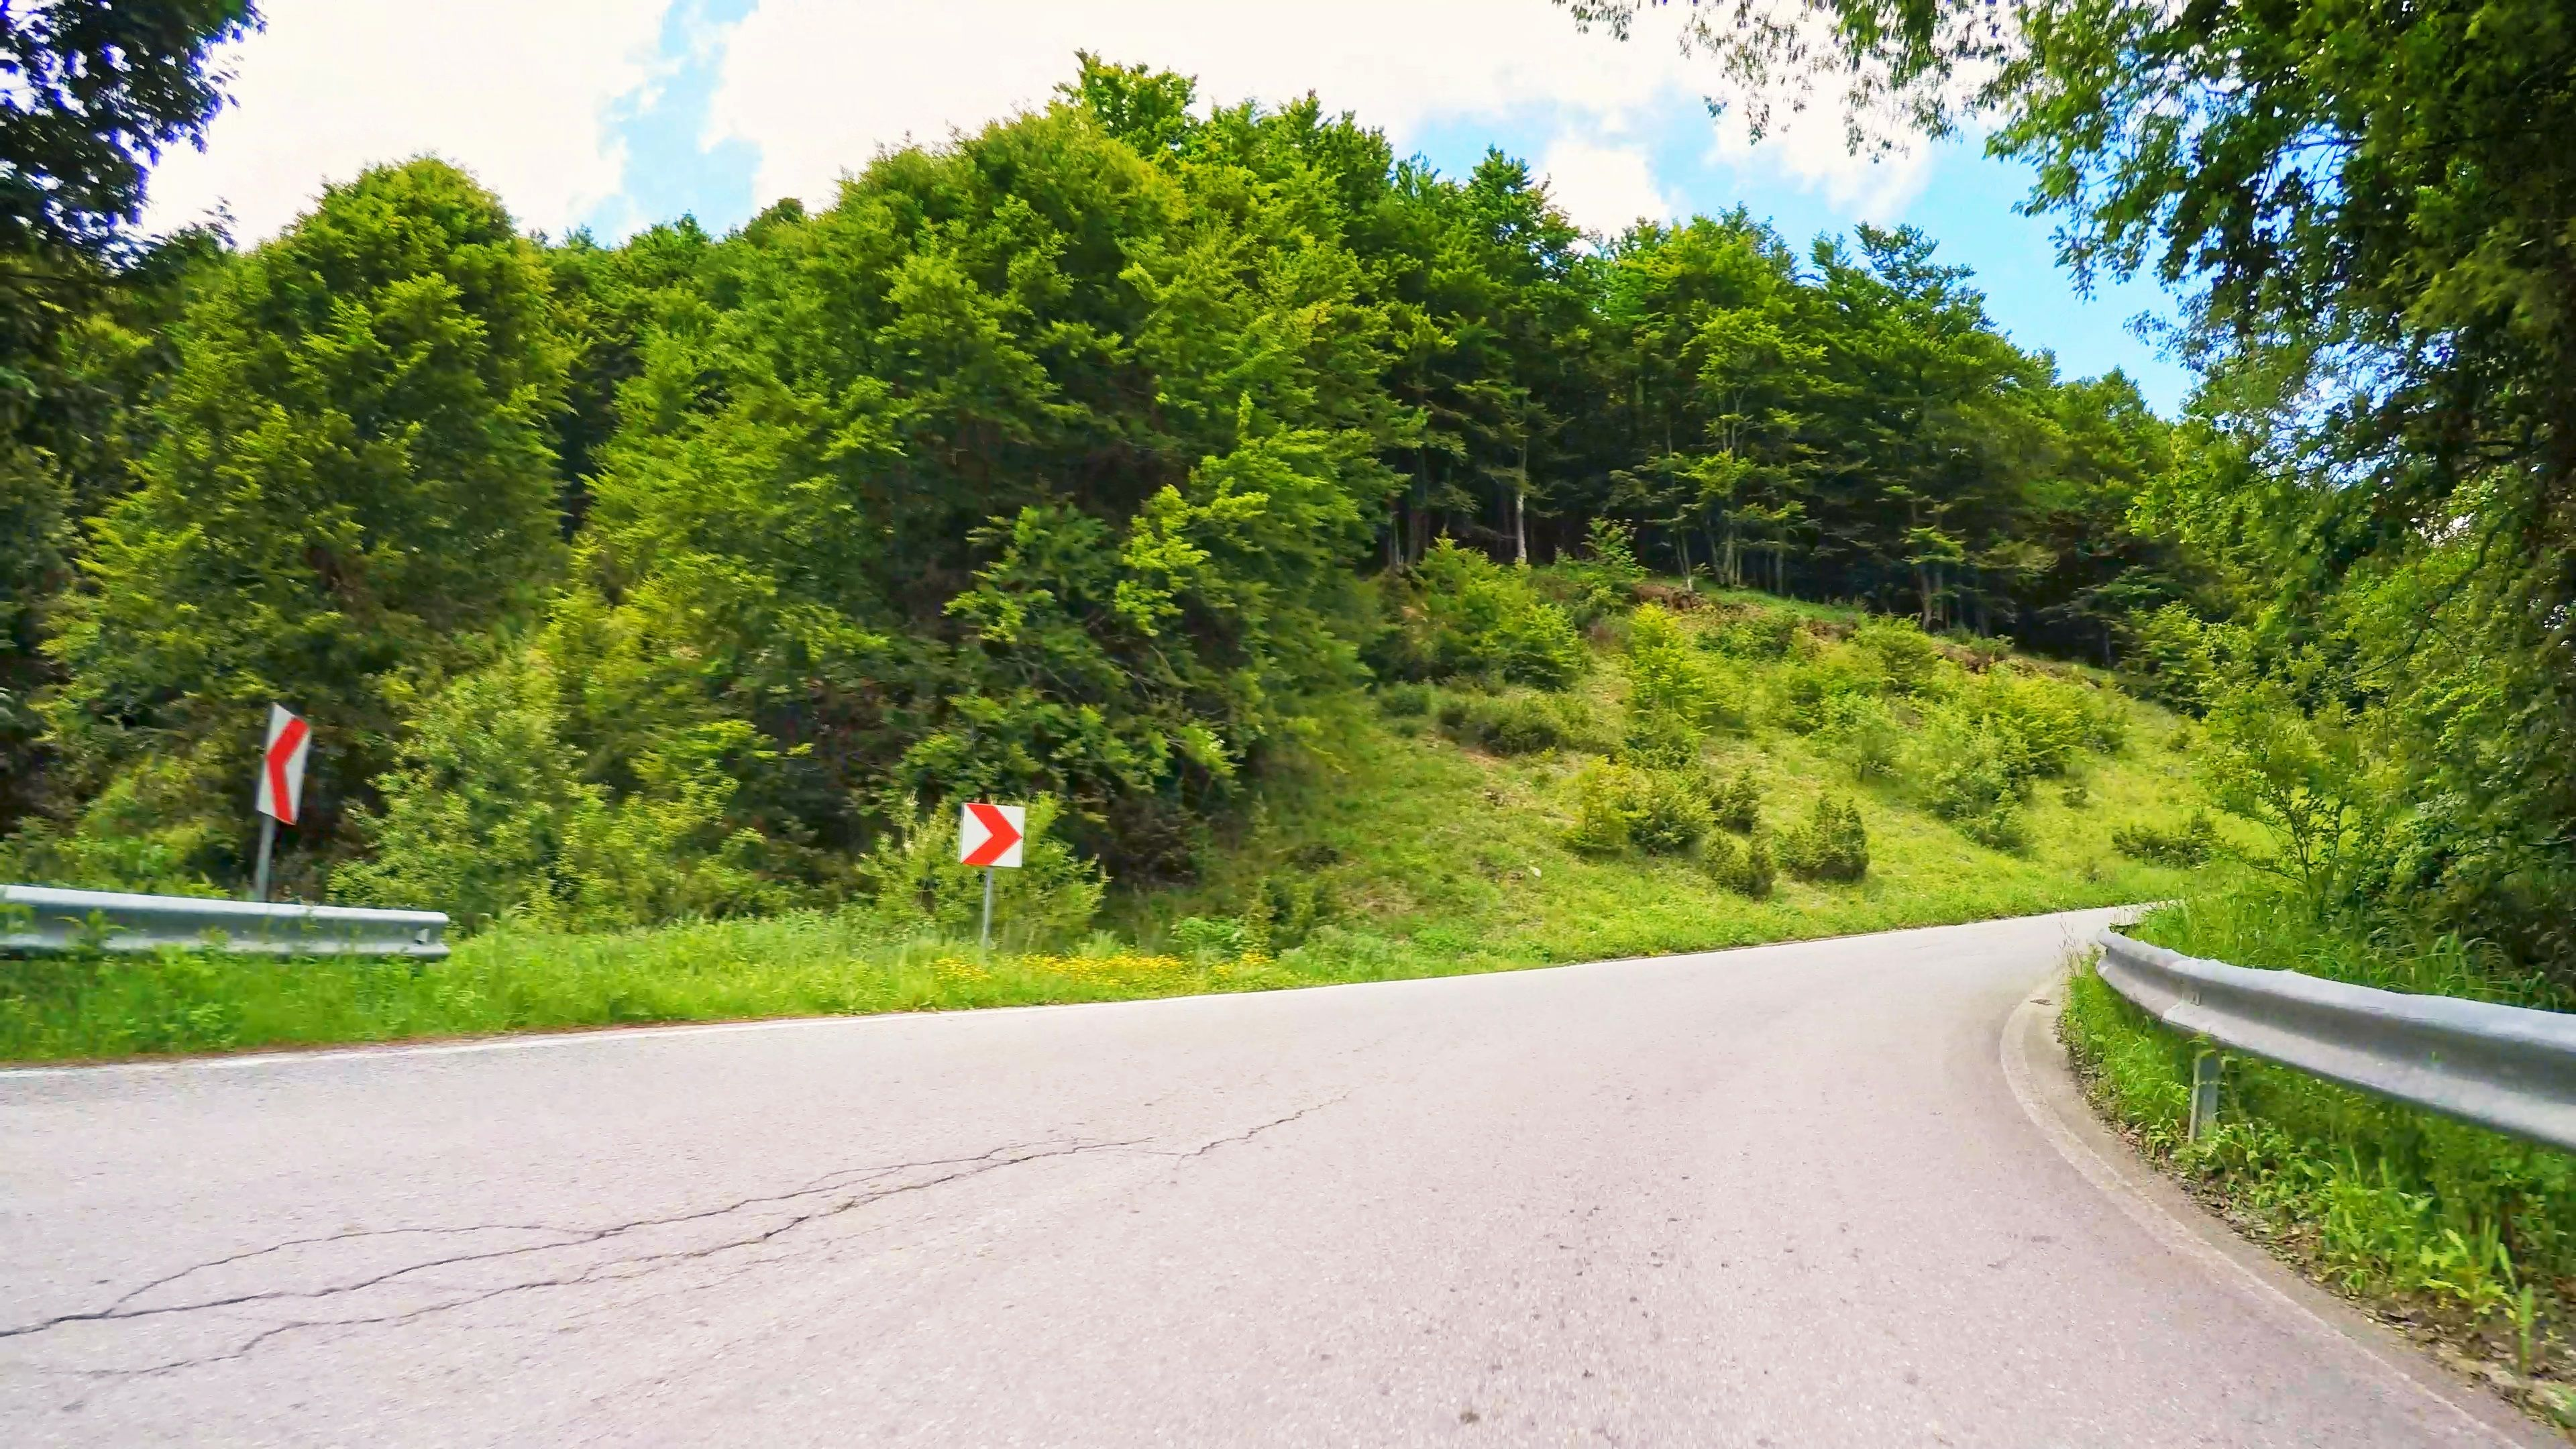 POV drive nature forest green trees sunshine sunny asphalt